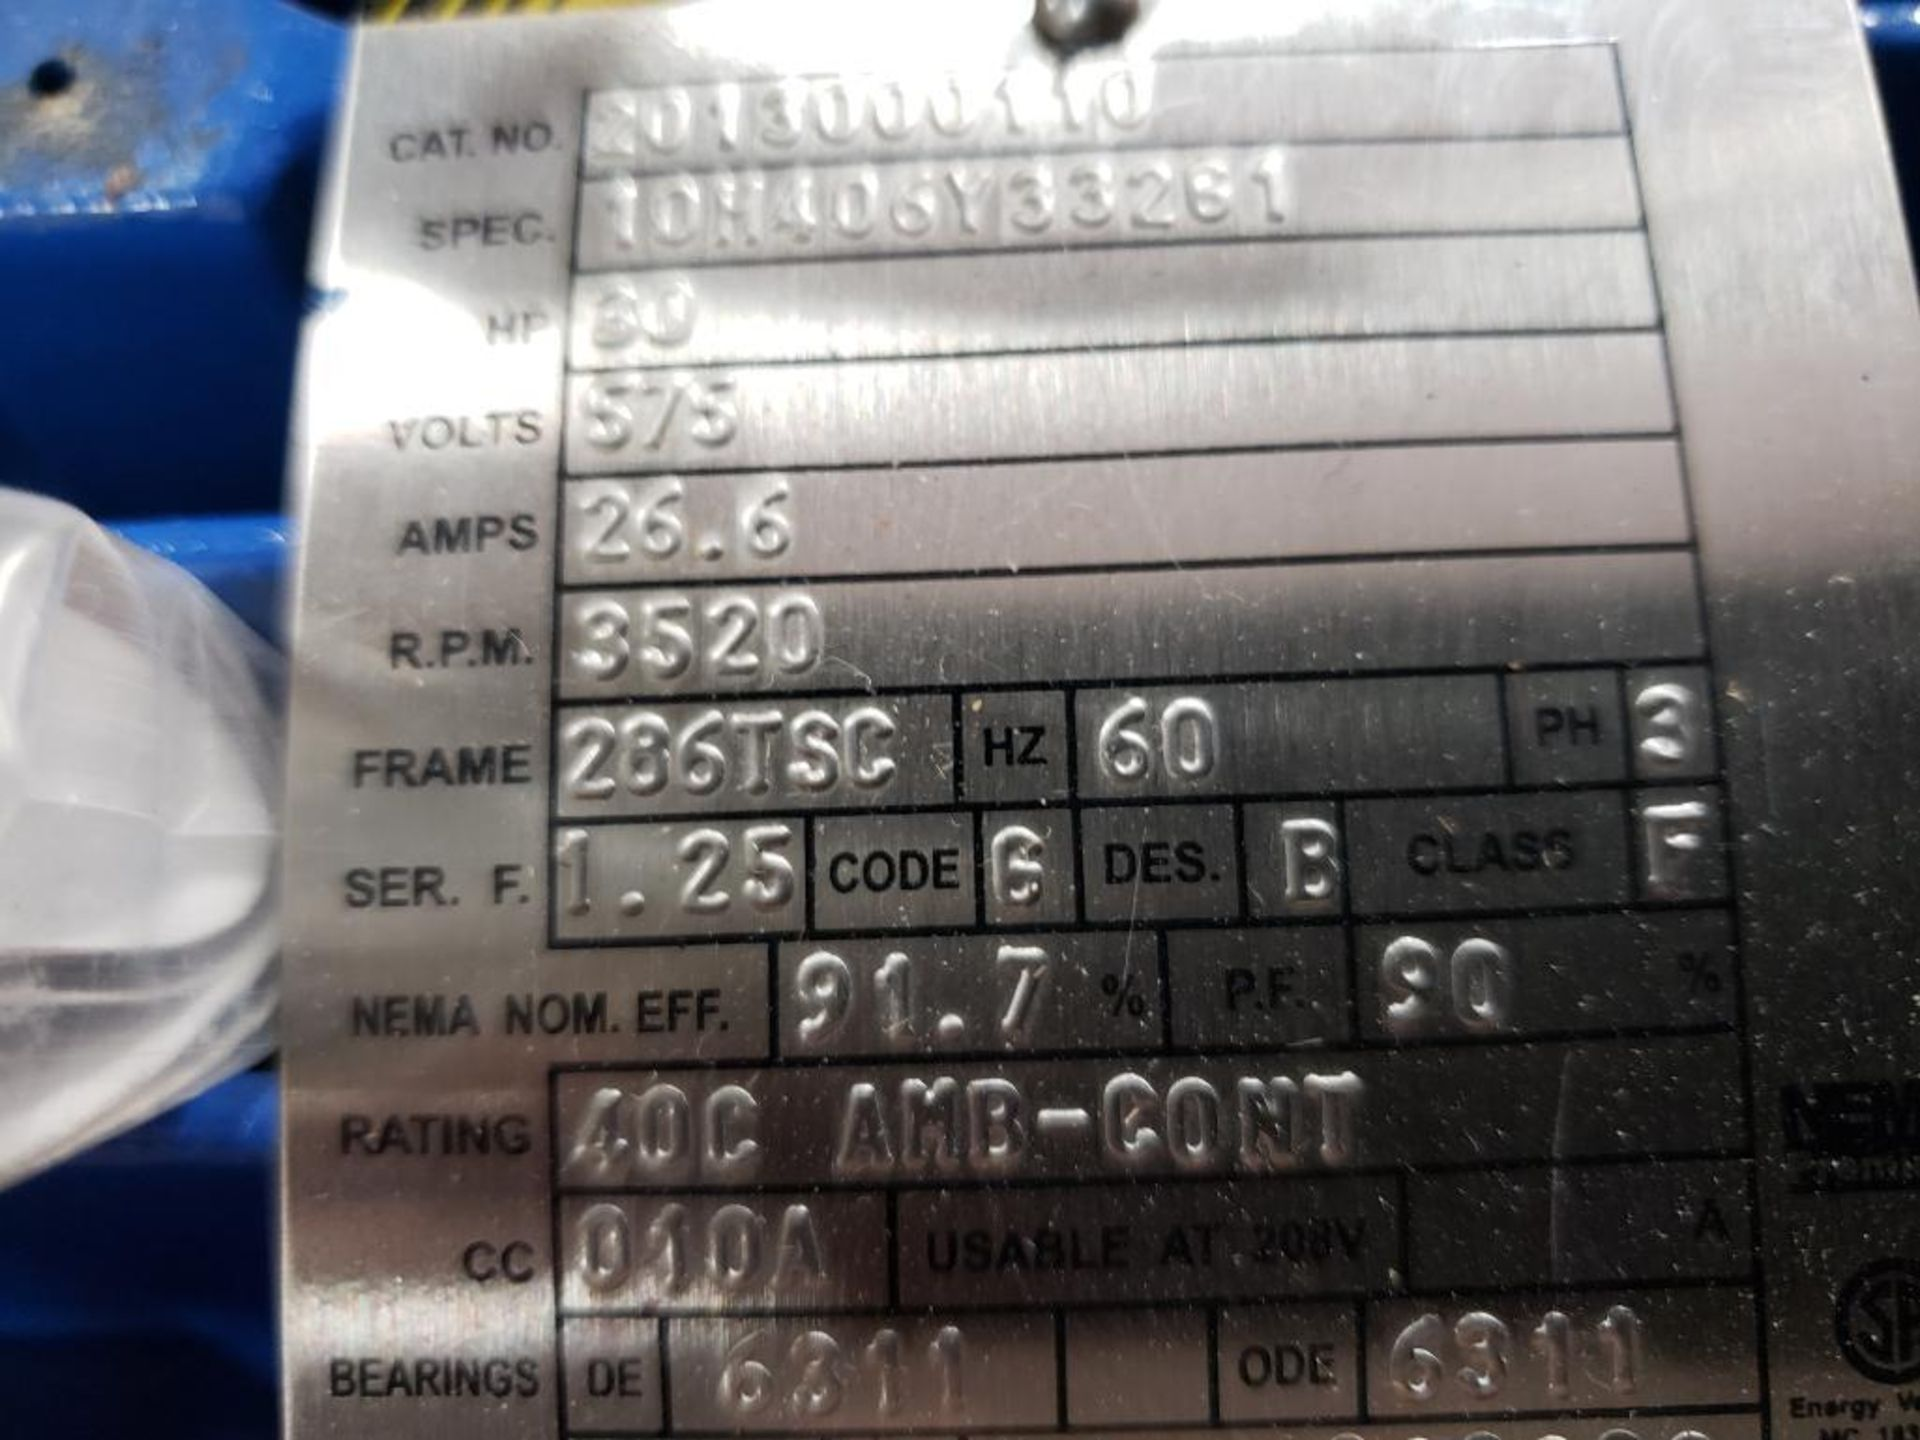 30HP Baldor Reliance 3PH motor. 2013000110. 575V, 3520RPM, 286TSC-Frame. - Image 4 of 6